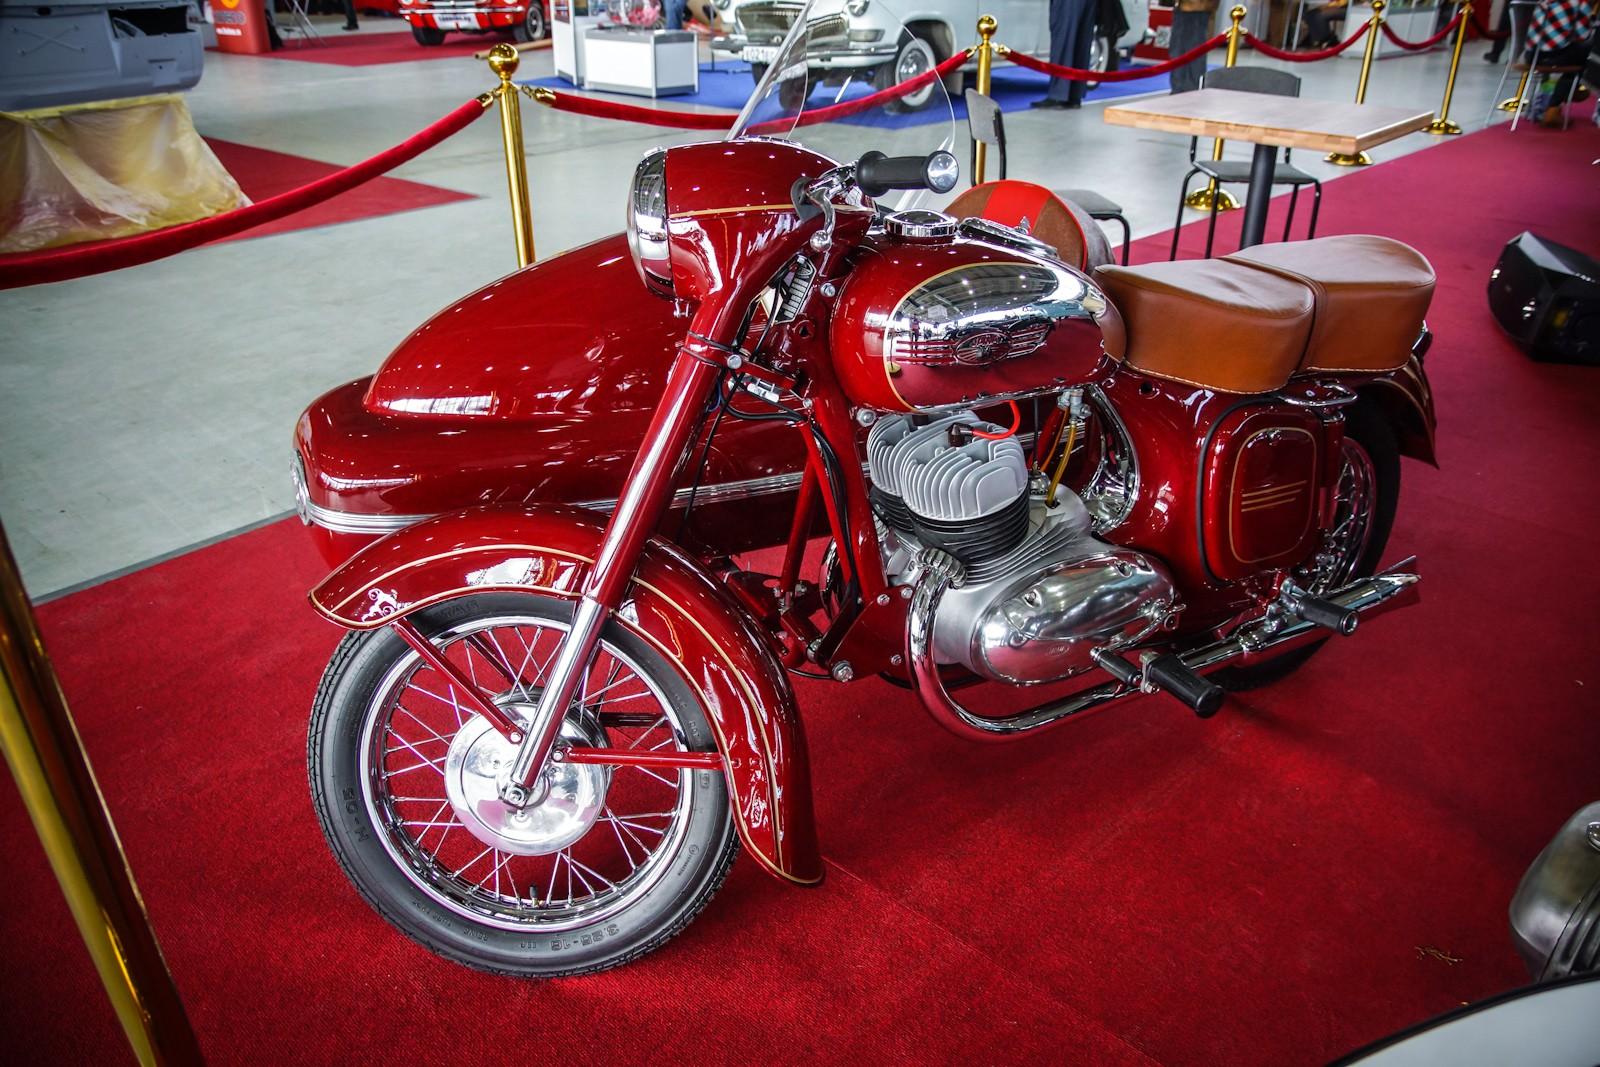 ява мотоцикл фото новые цветочная